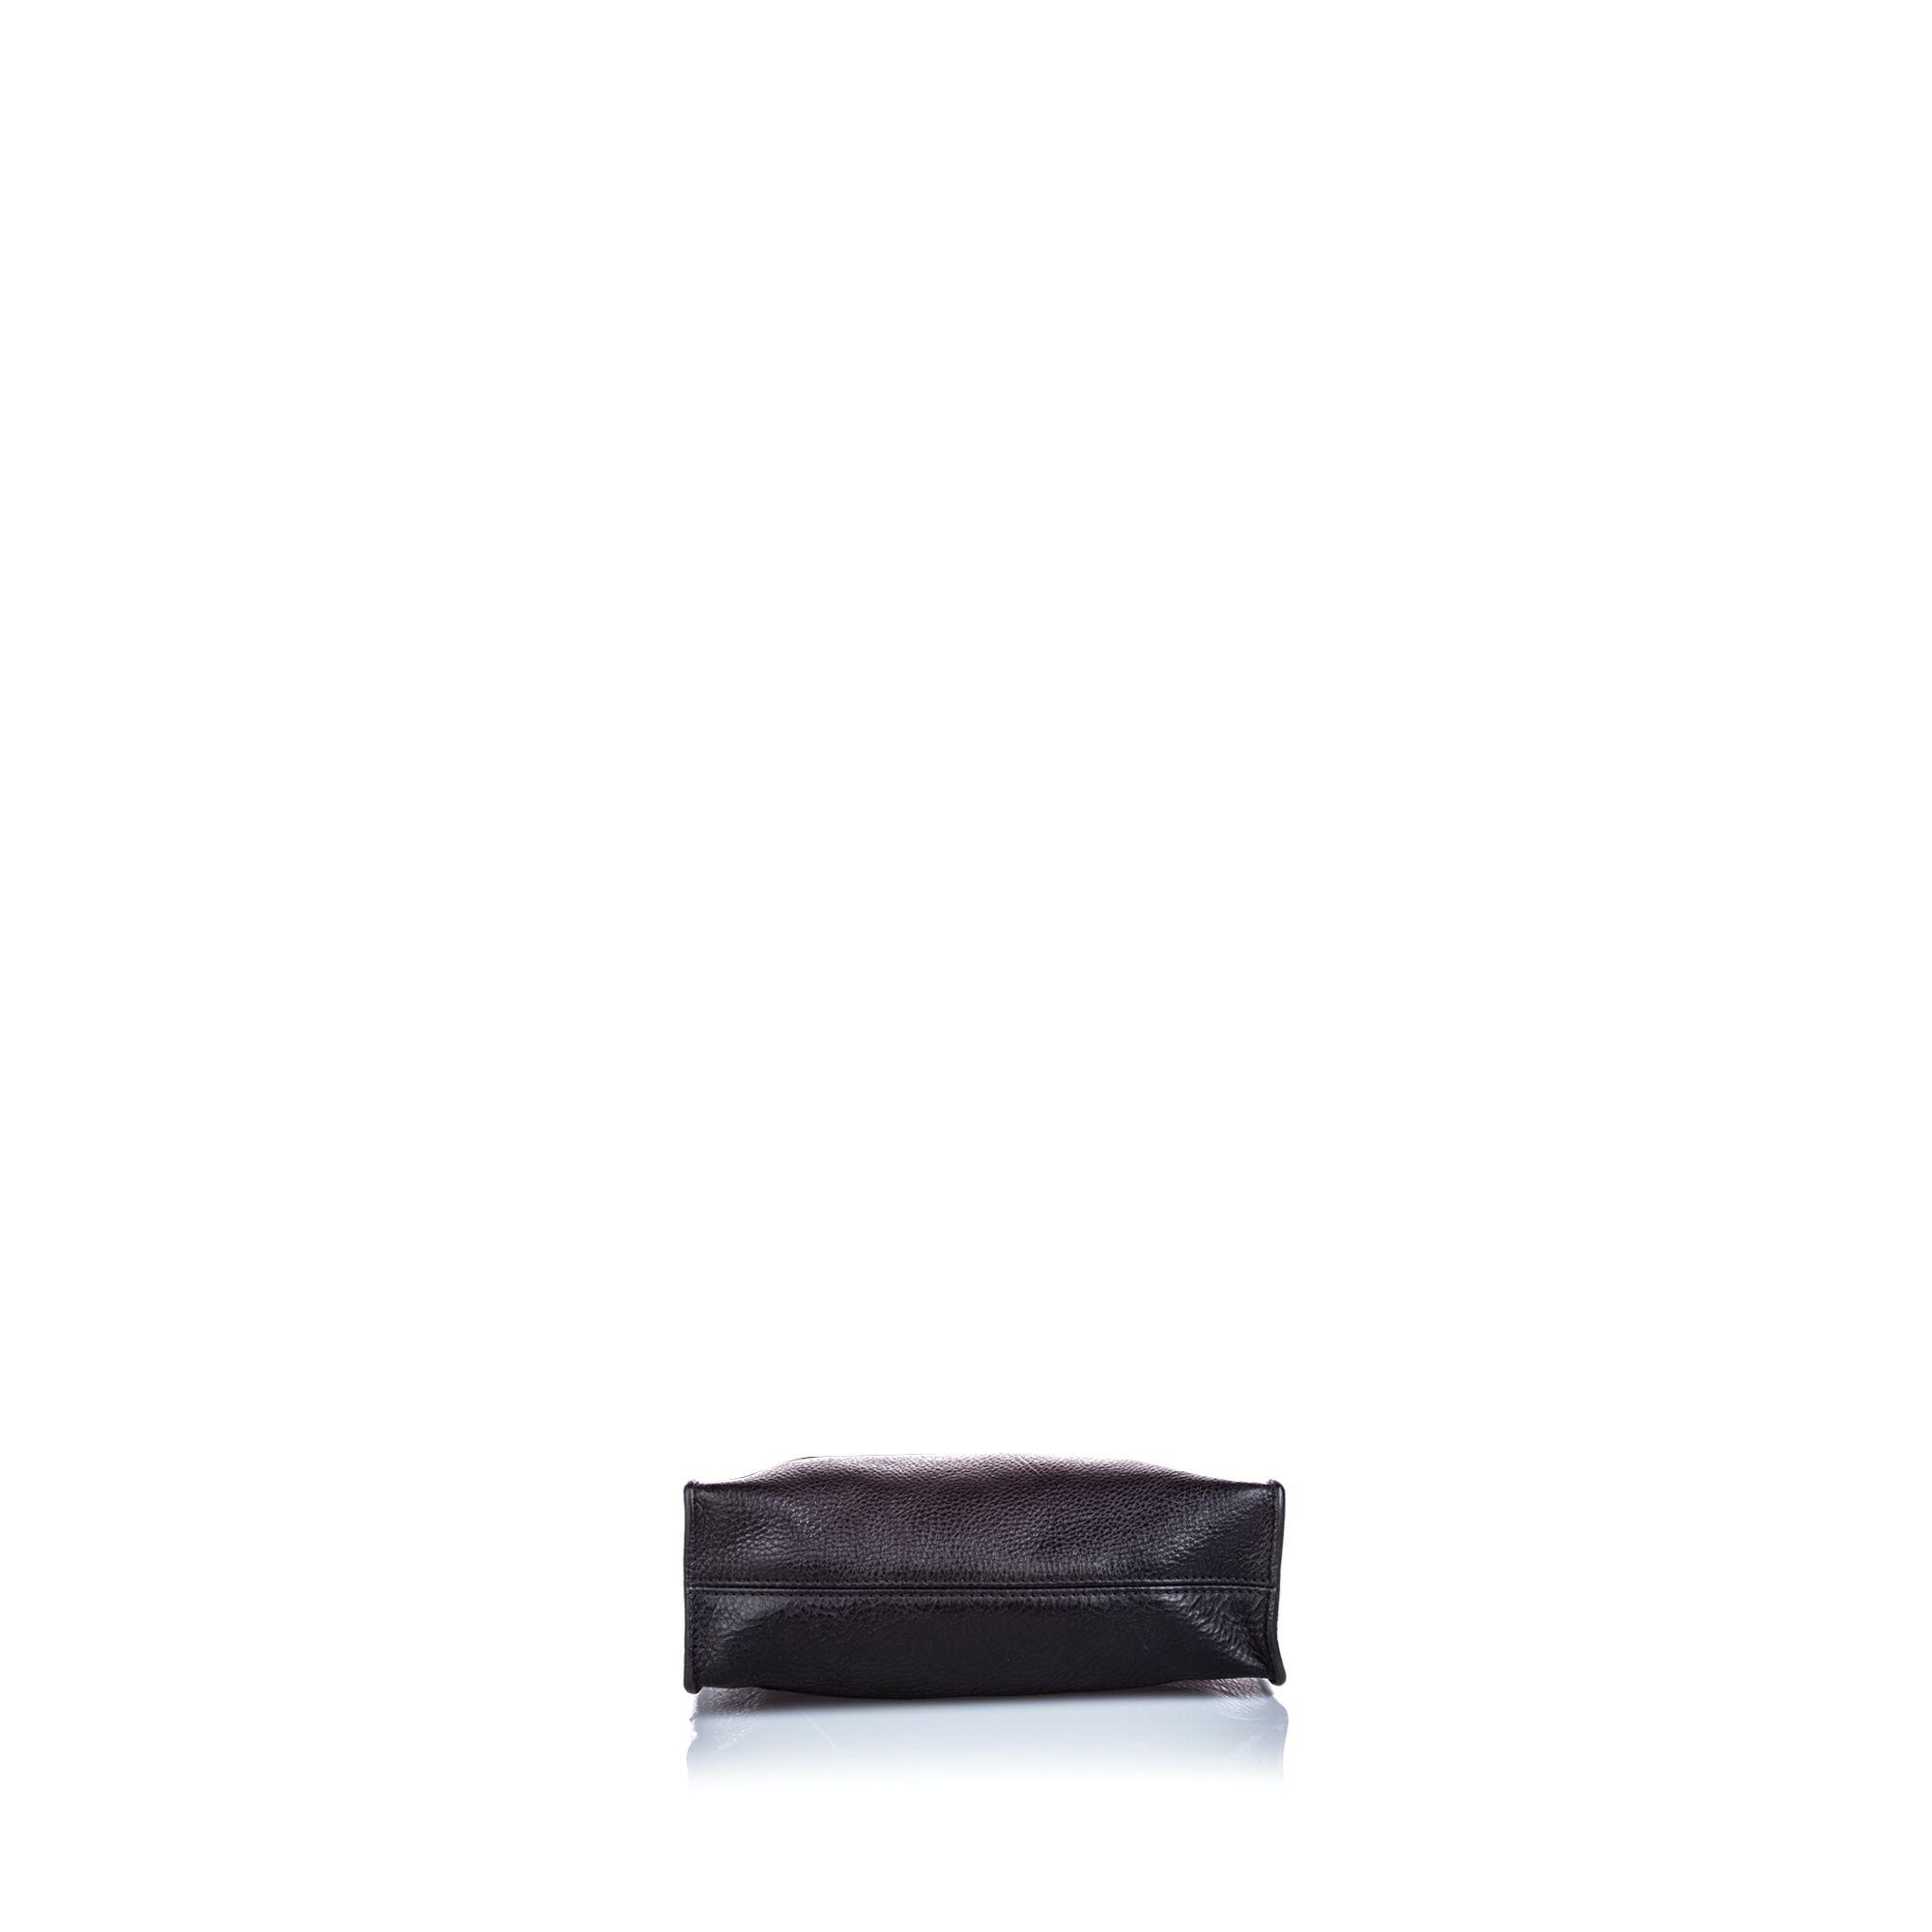 Vintage Mulberry Antony Messenger Bag Black